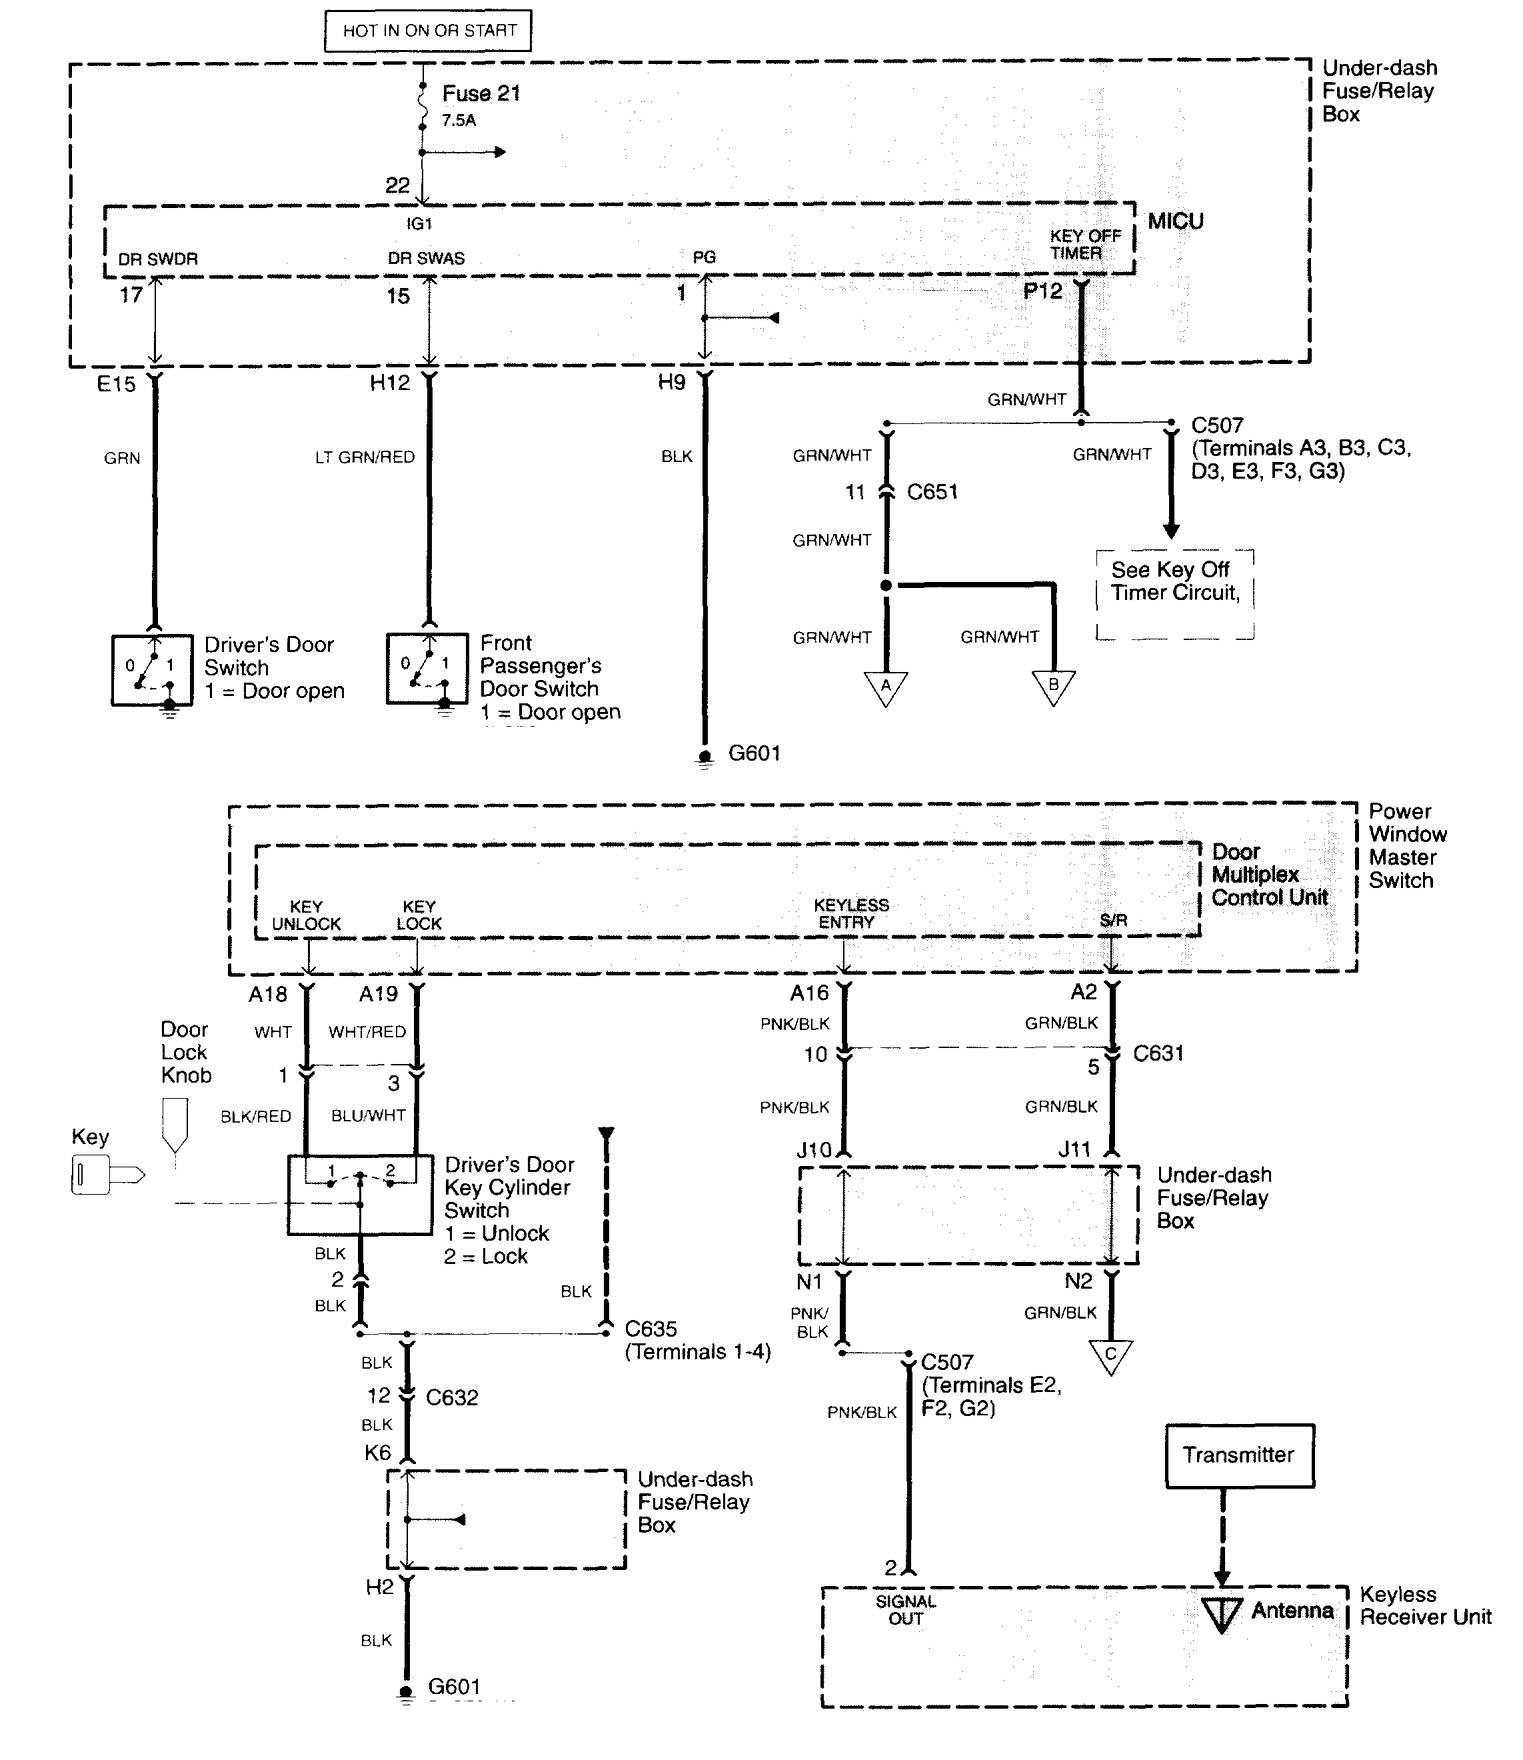 2003 Acura Tl Wiring Diagram - Cars Wiring Diagram